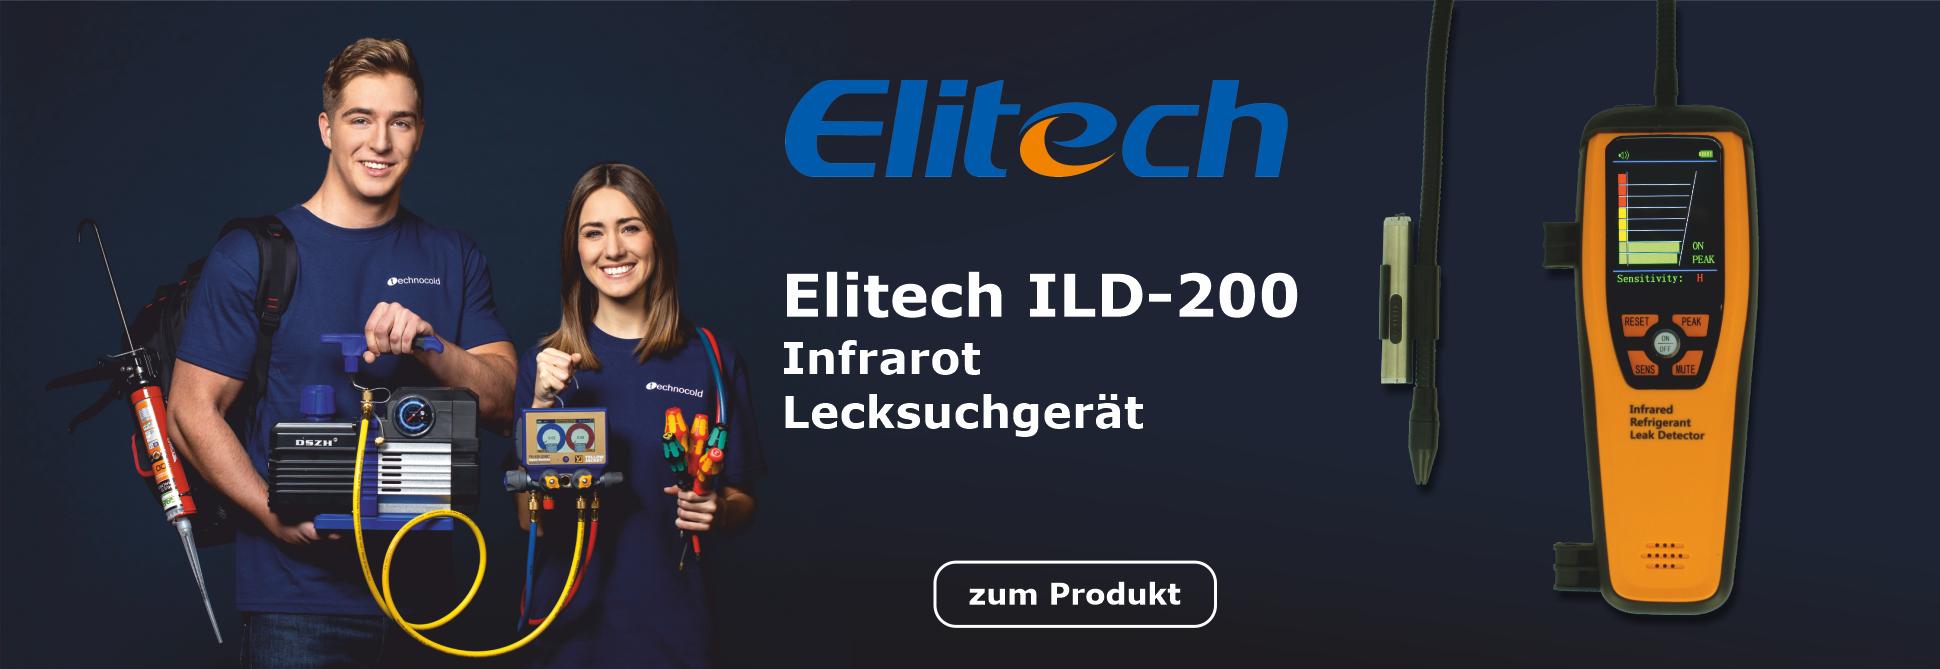 Banner Elitech